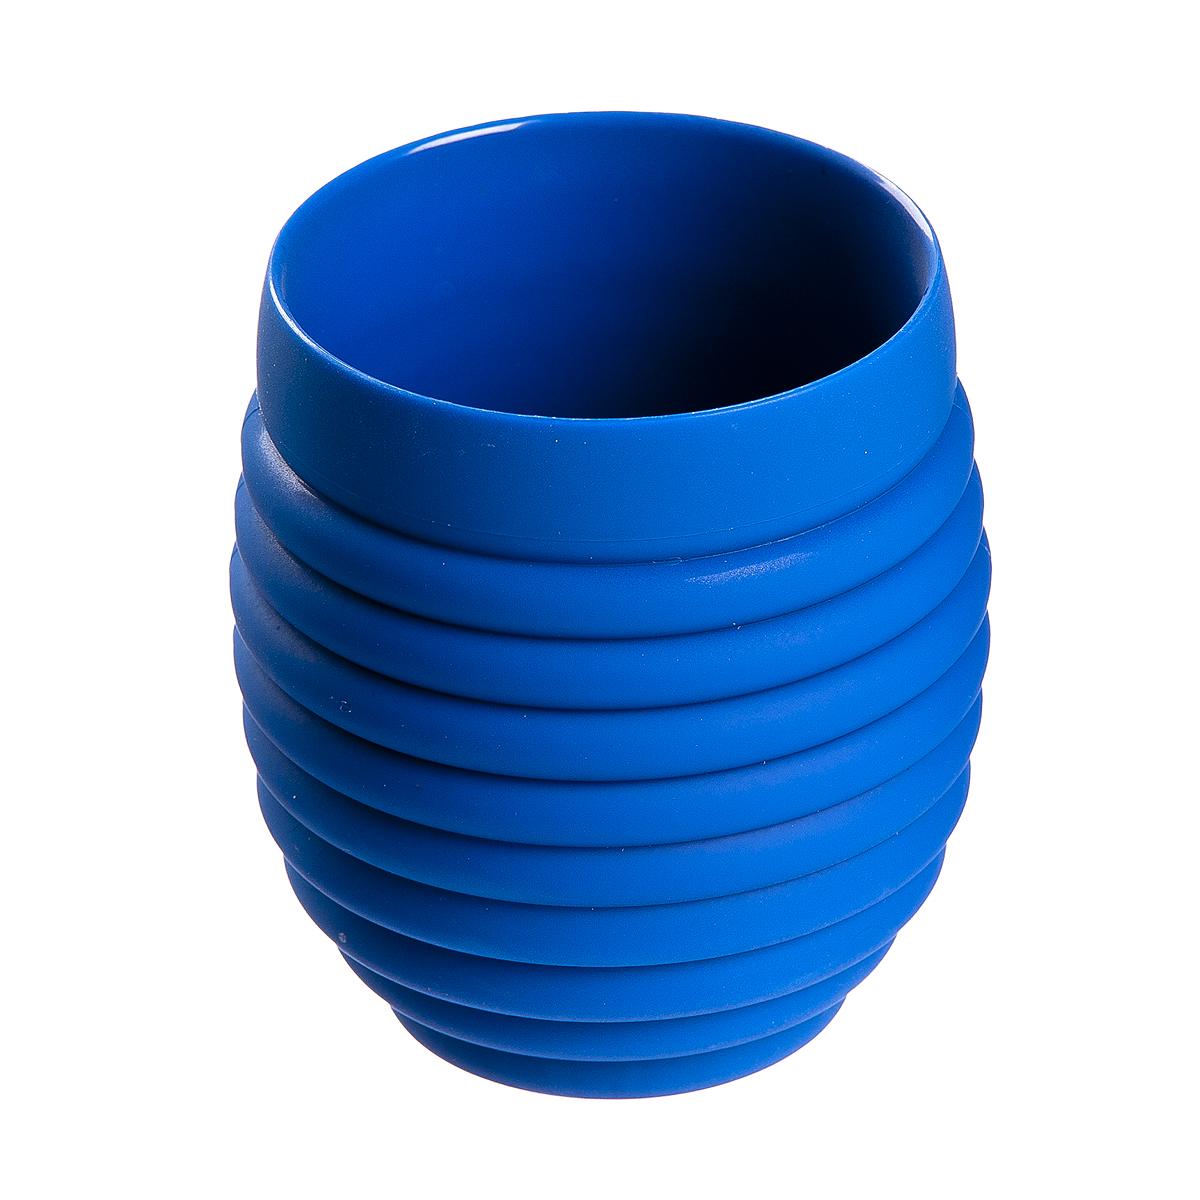 Стакан для ванной Fresh Code Волна, цвет: синий, 350 мл стакан для ванной fresh code бамбук цвет салатовый 500 мл